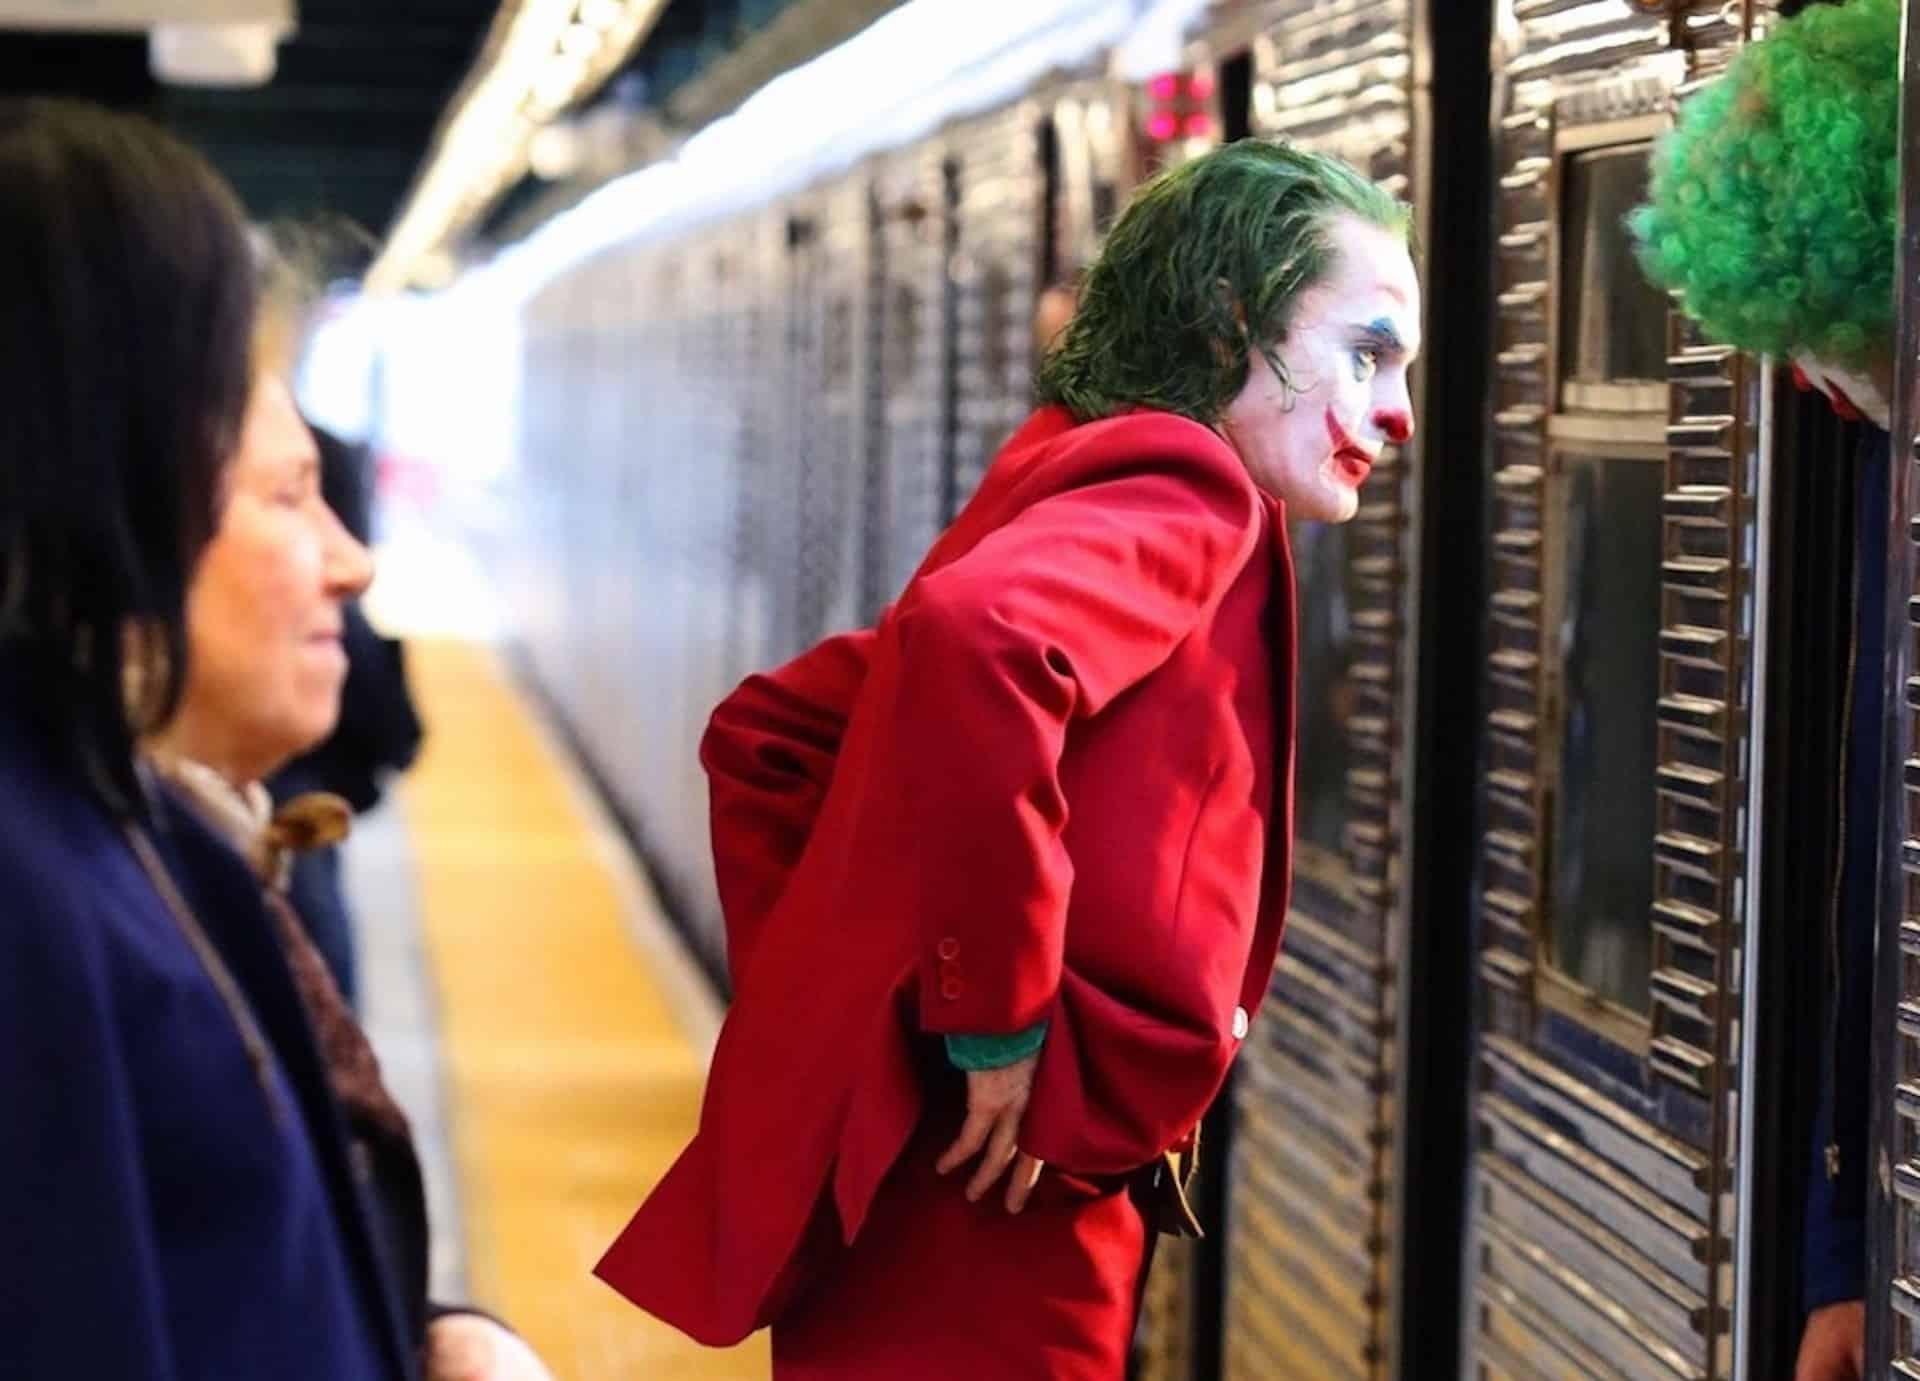 travestito da joker in metro milano con pistola finta. arrestato.